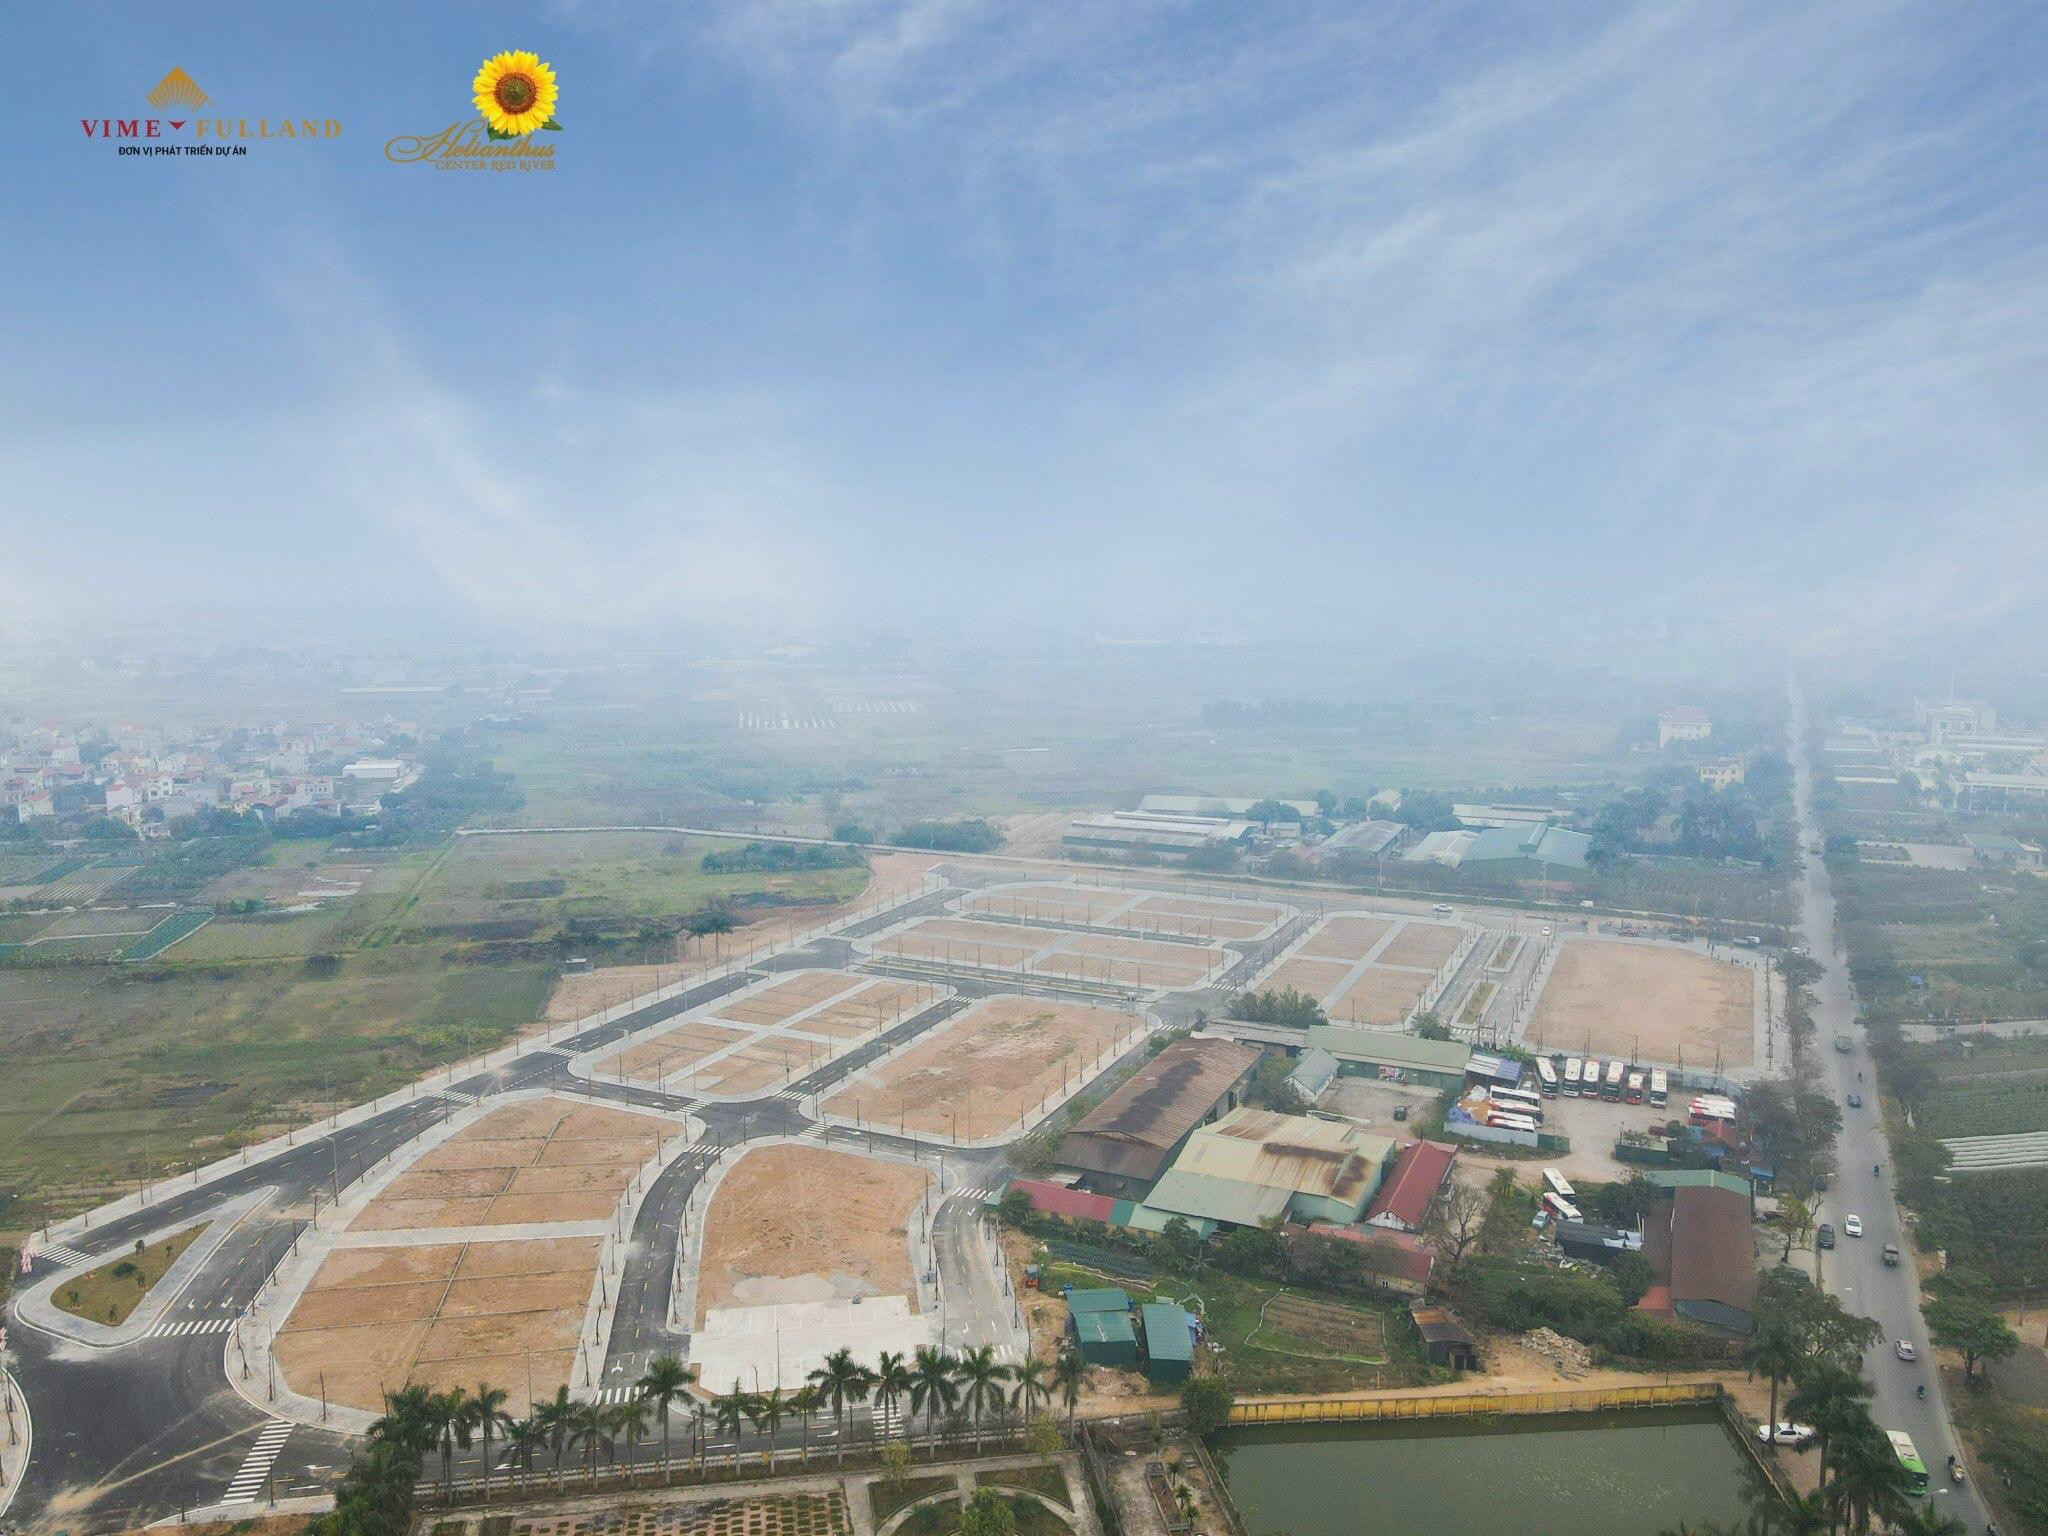 Flycam Dự án Vimefulland Cổ Dương Helianthus Center Red River tháng 5 năm 2021